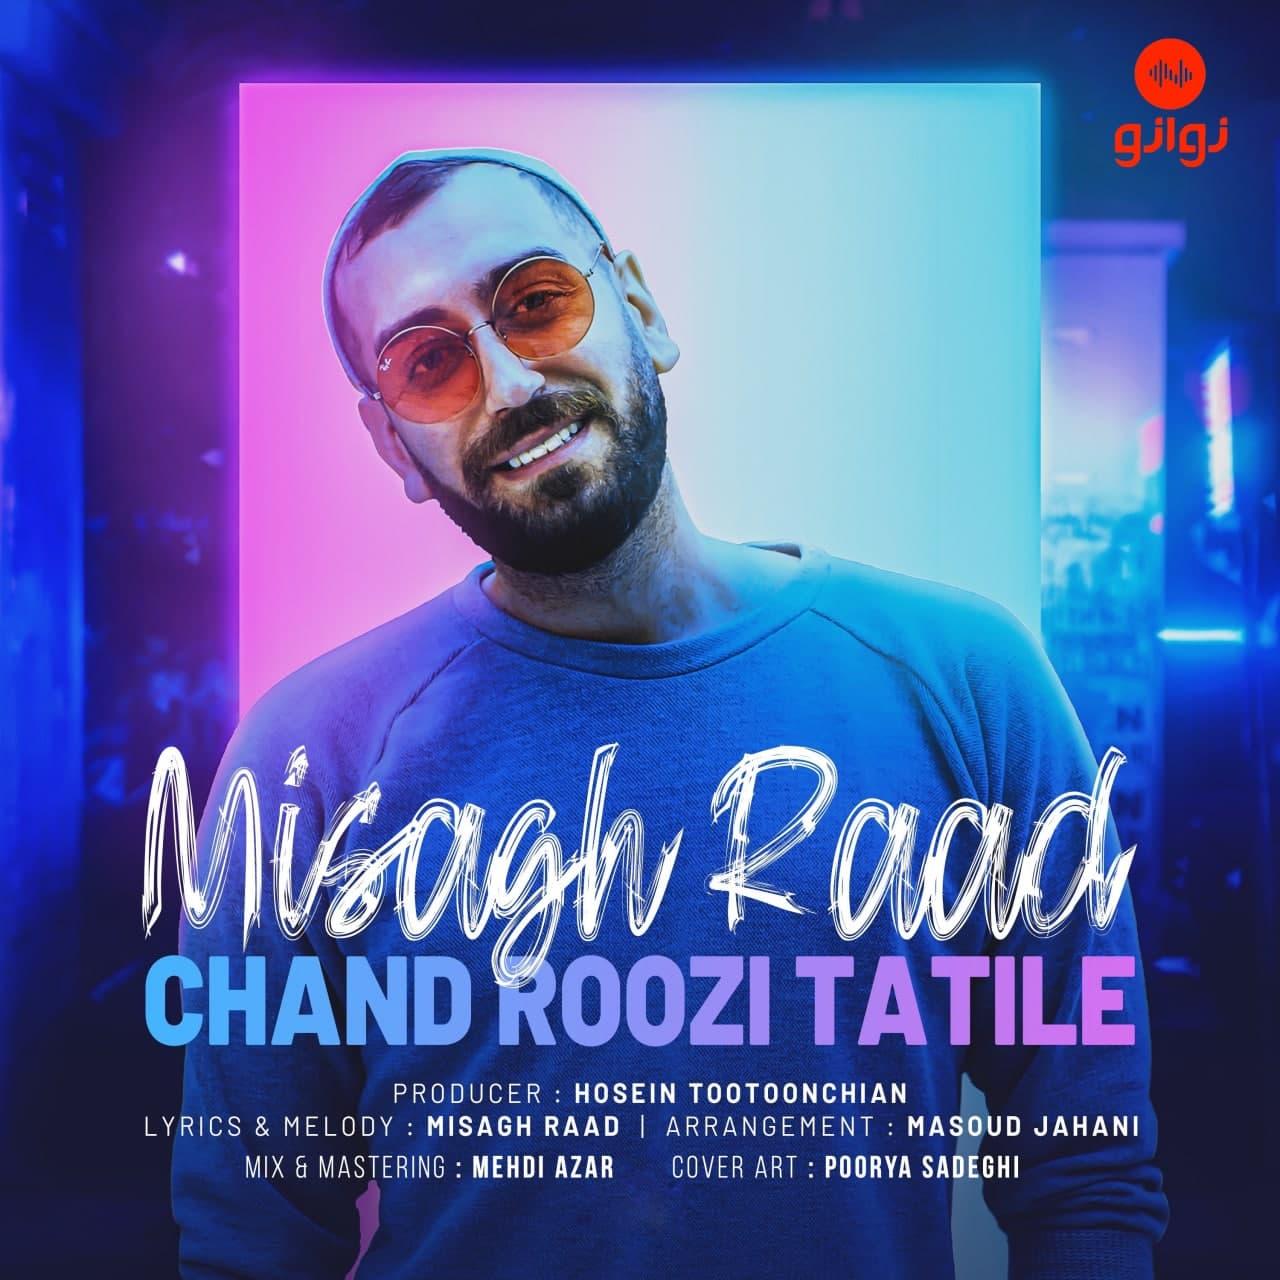 Misagh Raad – Chand Roozi Tatile